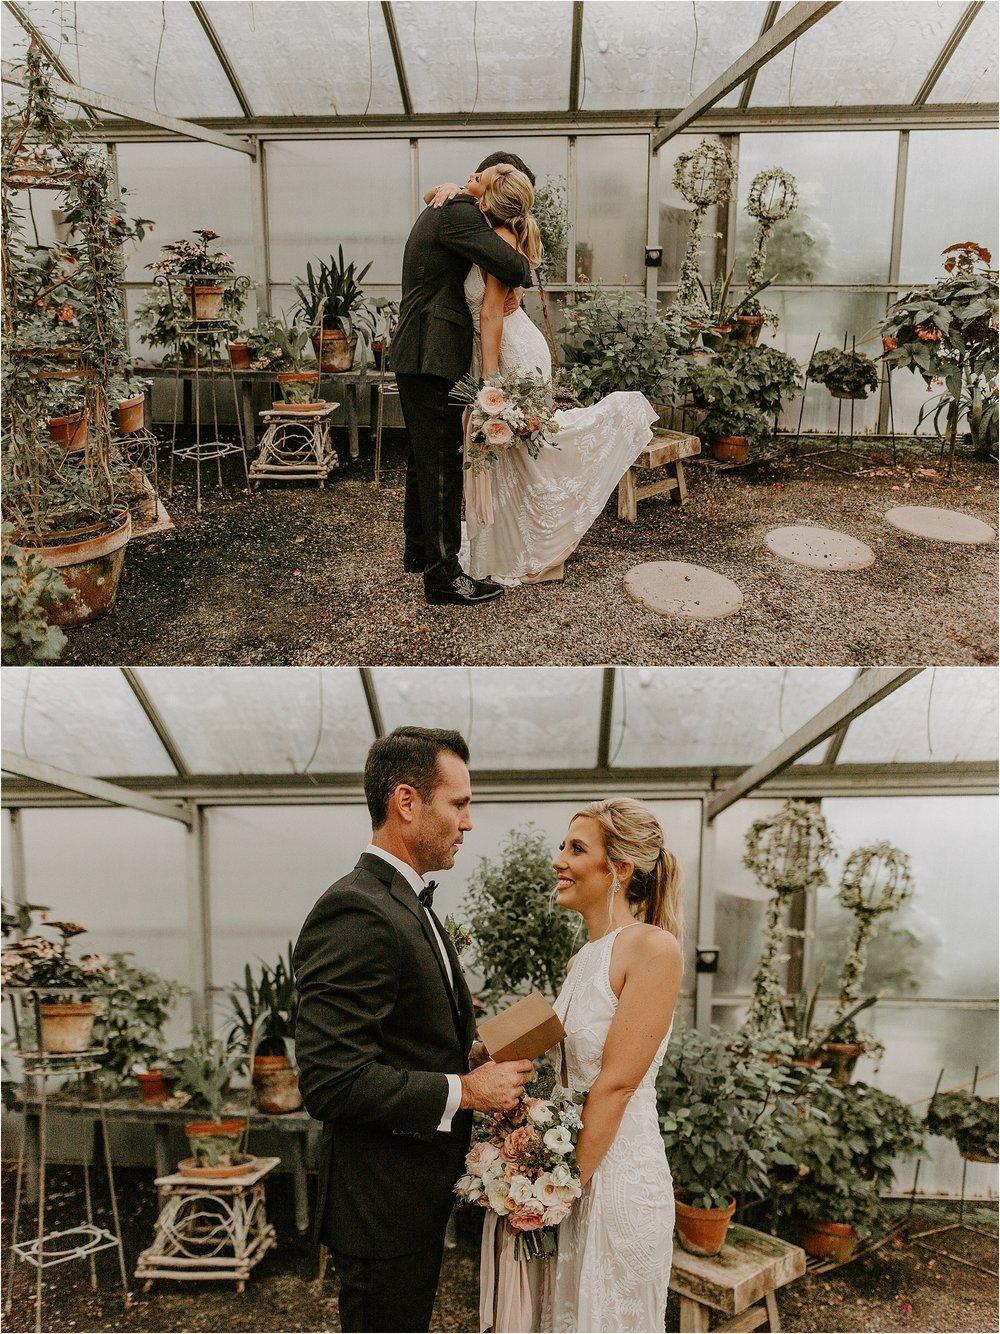 Sarah_Brookhart_Hortulus_Farm_Garden_and_Nursey_Wedding_Photographer_0023.jpg